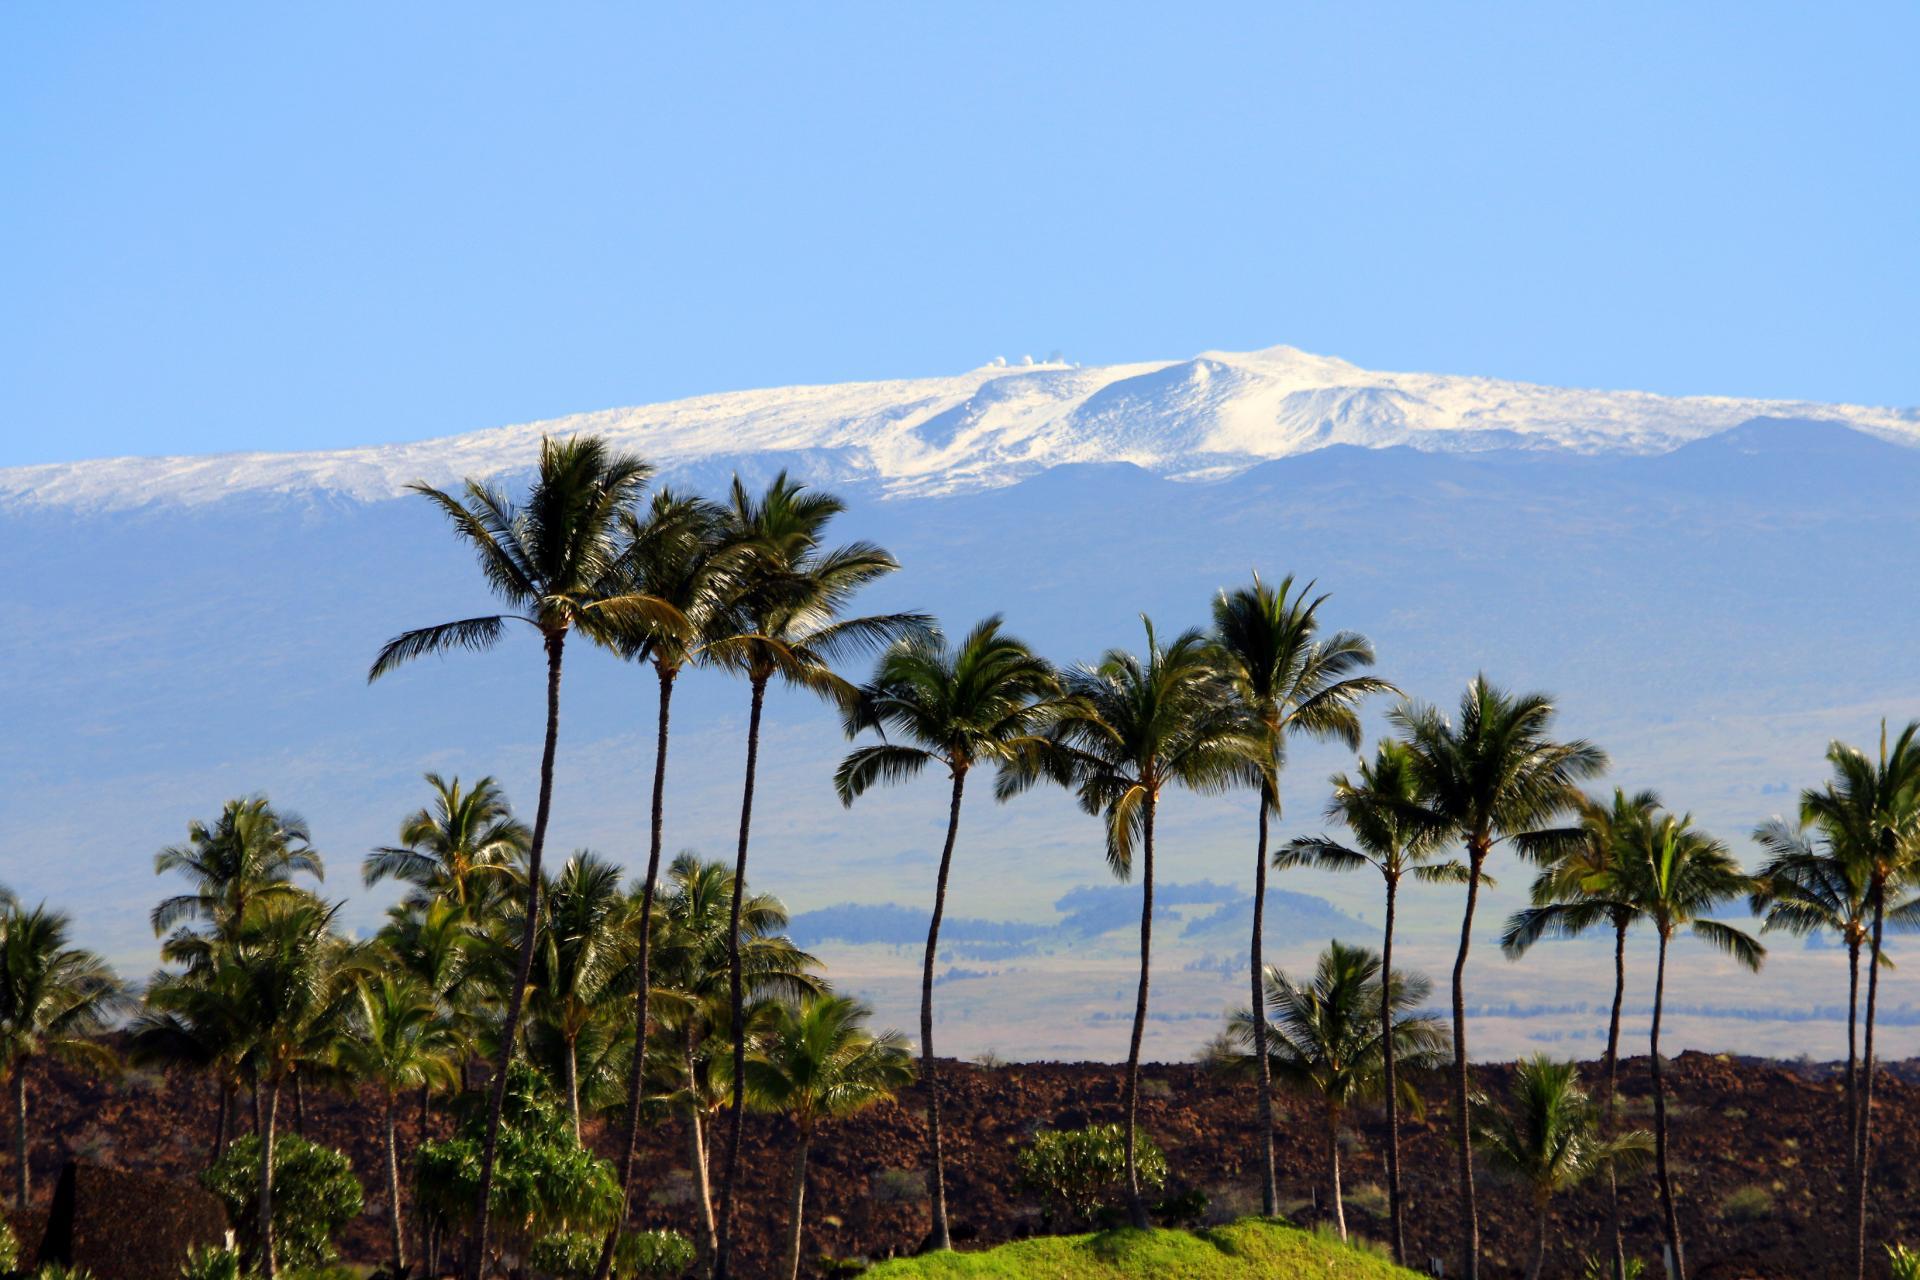 Snow topped Maunakea from the Kohala Coast